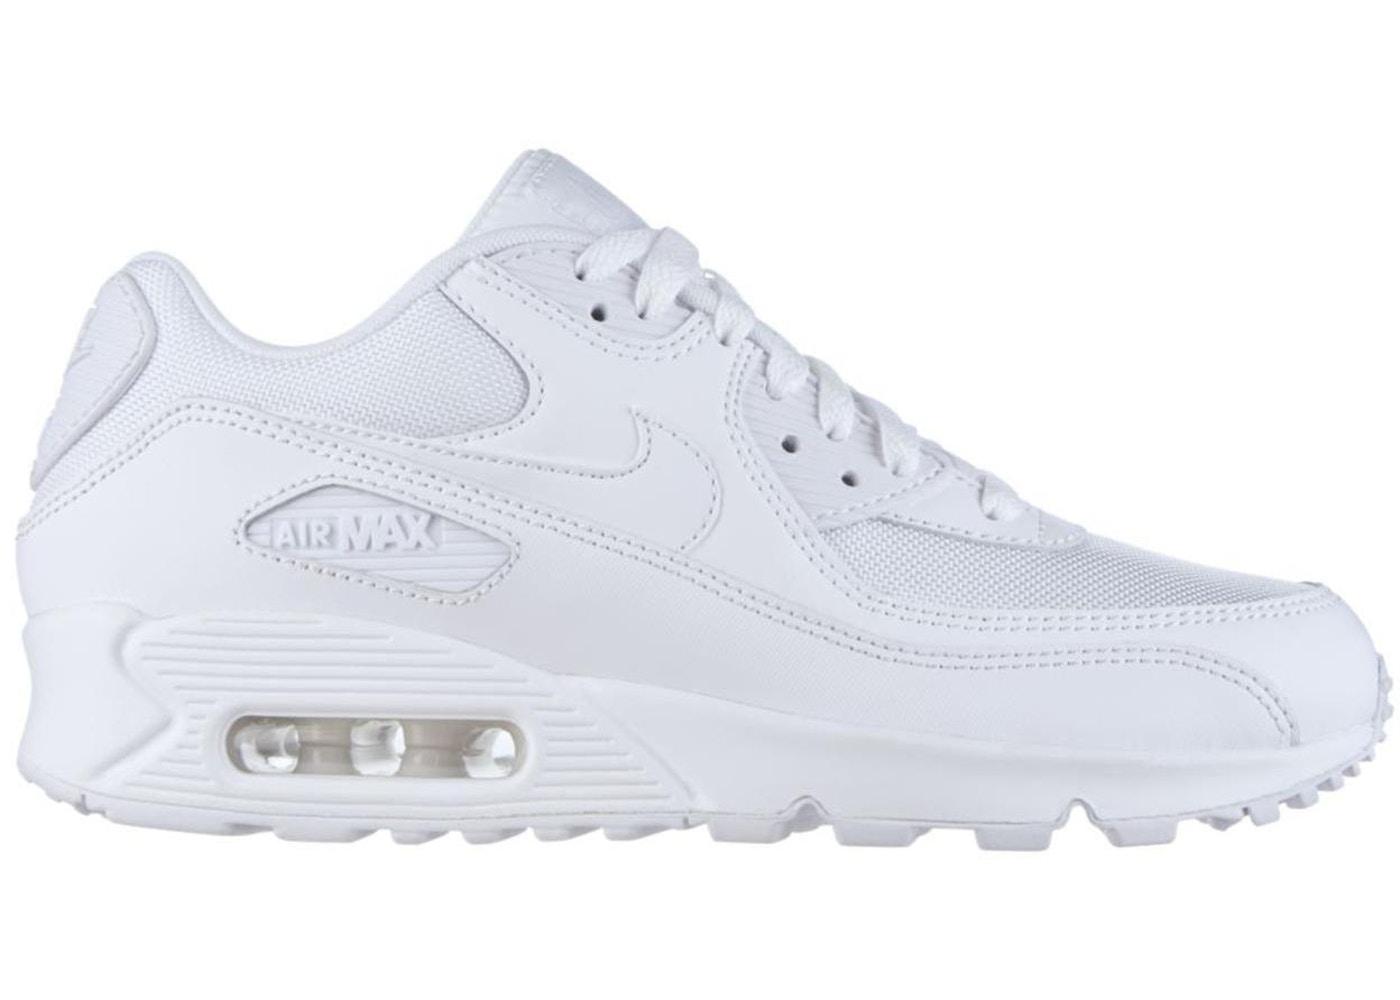 half off 8c3cb ea04c Buy Nike Air Max 90 Shoes   Deadstock Sneakers